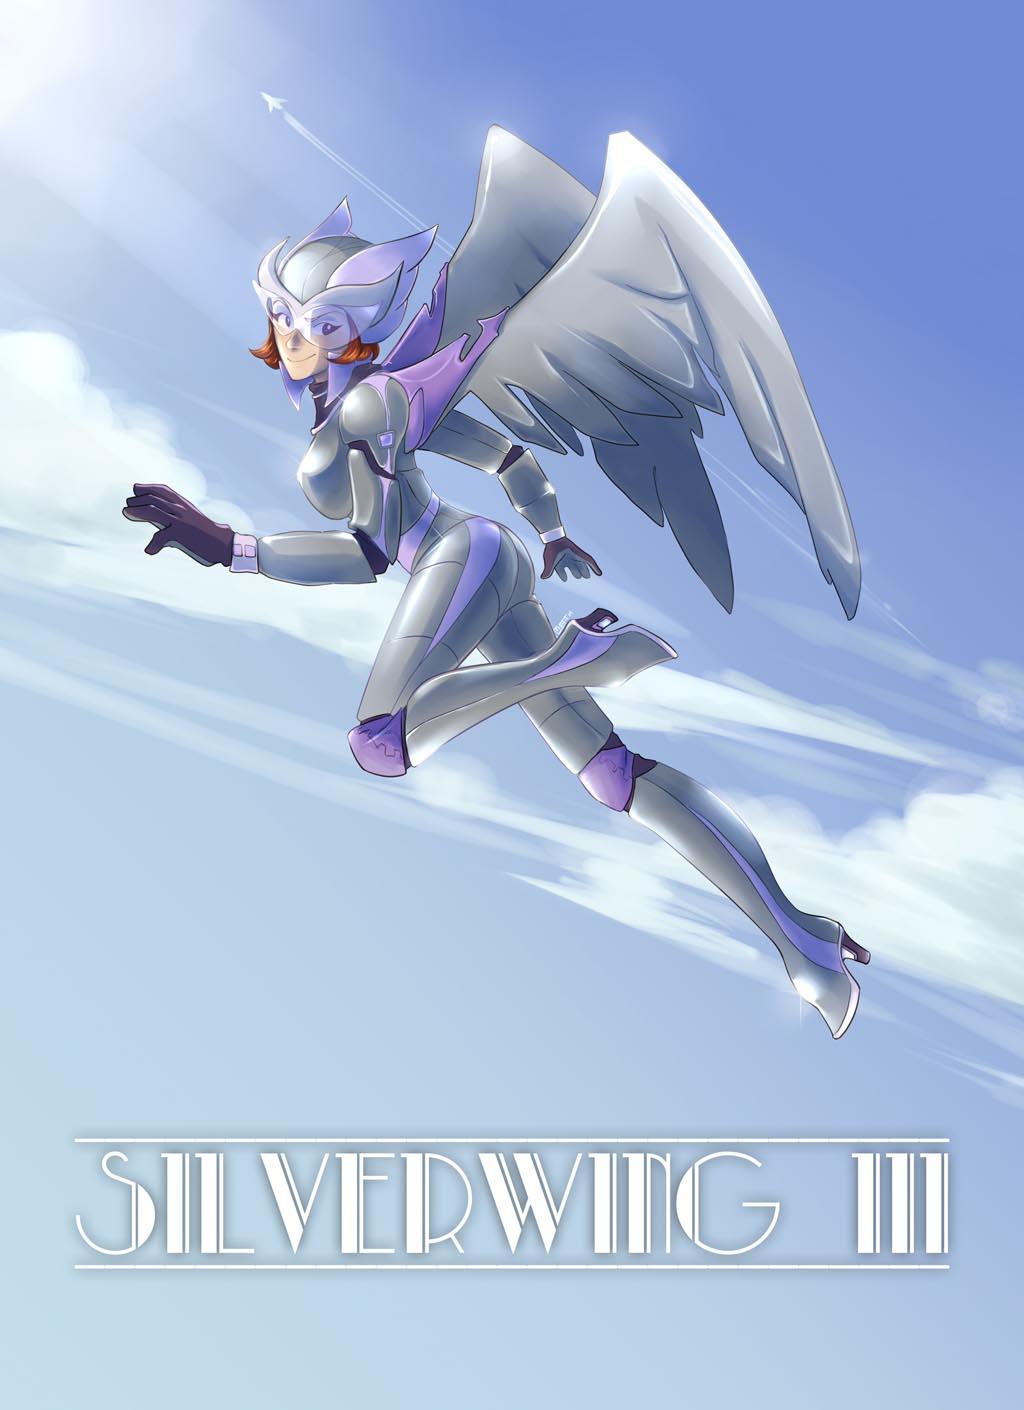 Arte Convidada: Silverwing III, por Maya Mint